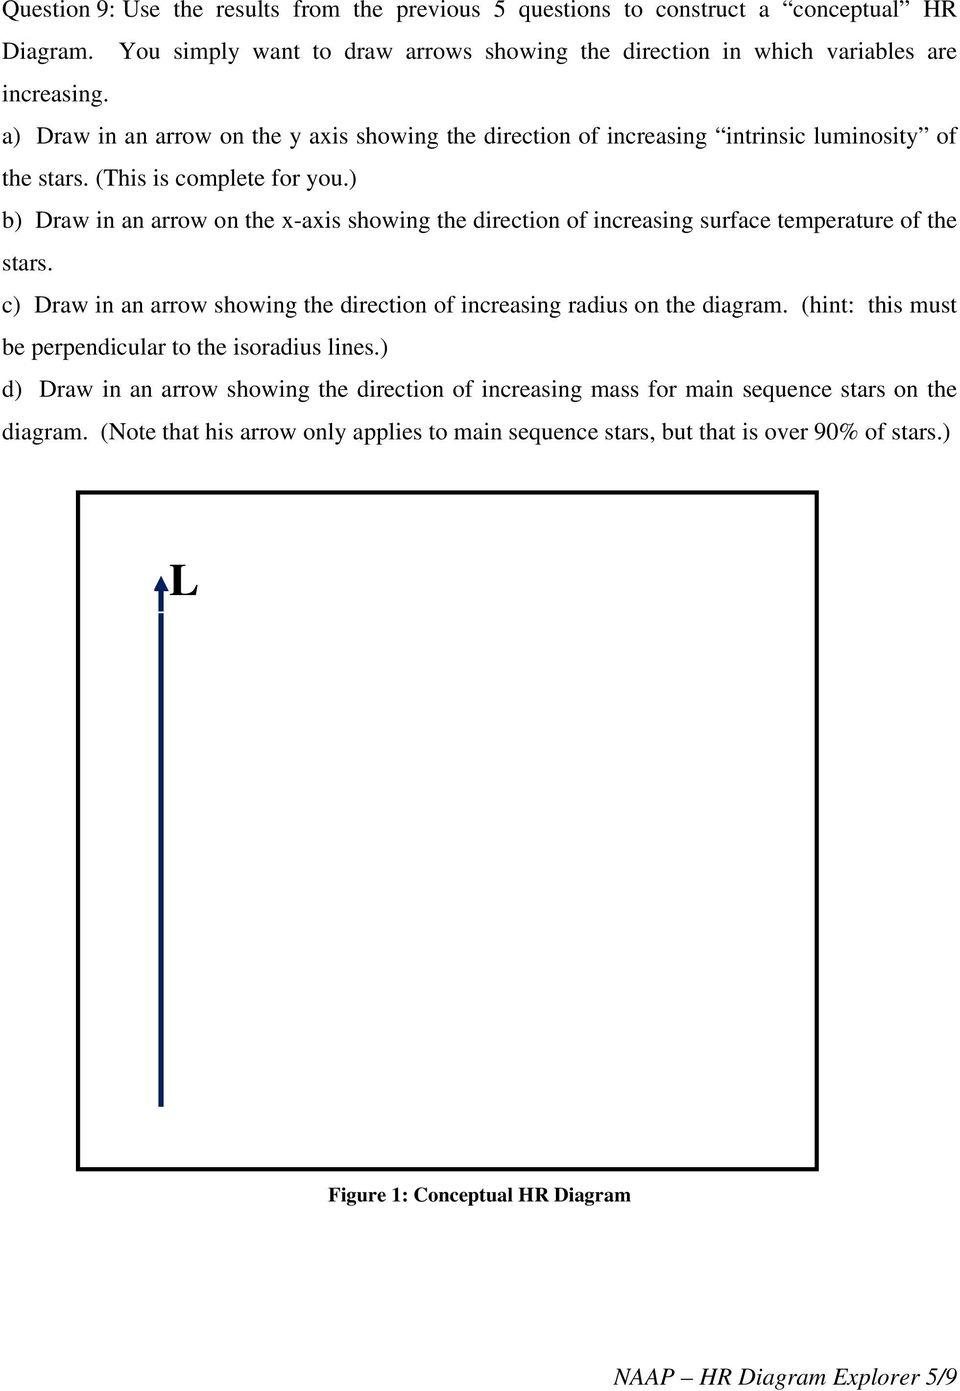 Hr Diagram Definition Hr Diagram Isoradius Lines Wiring Diagram Library